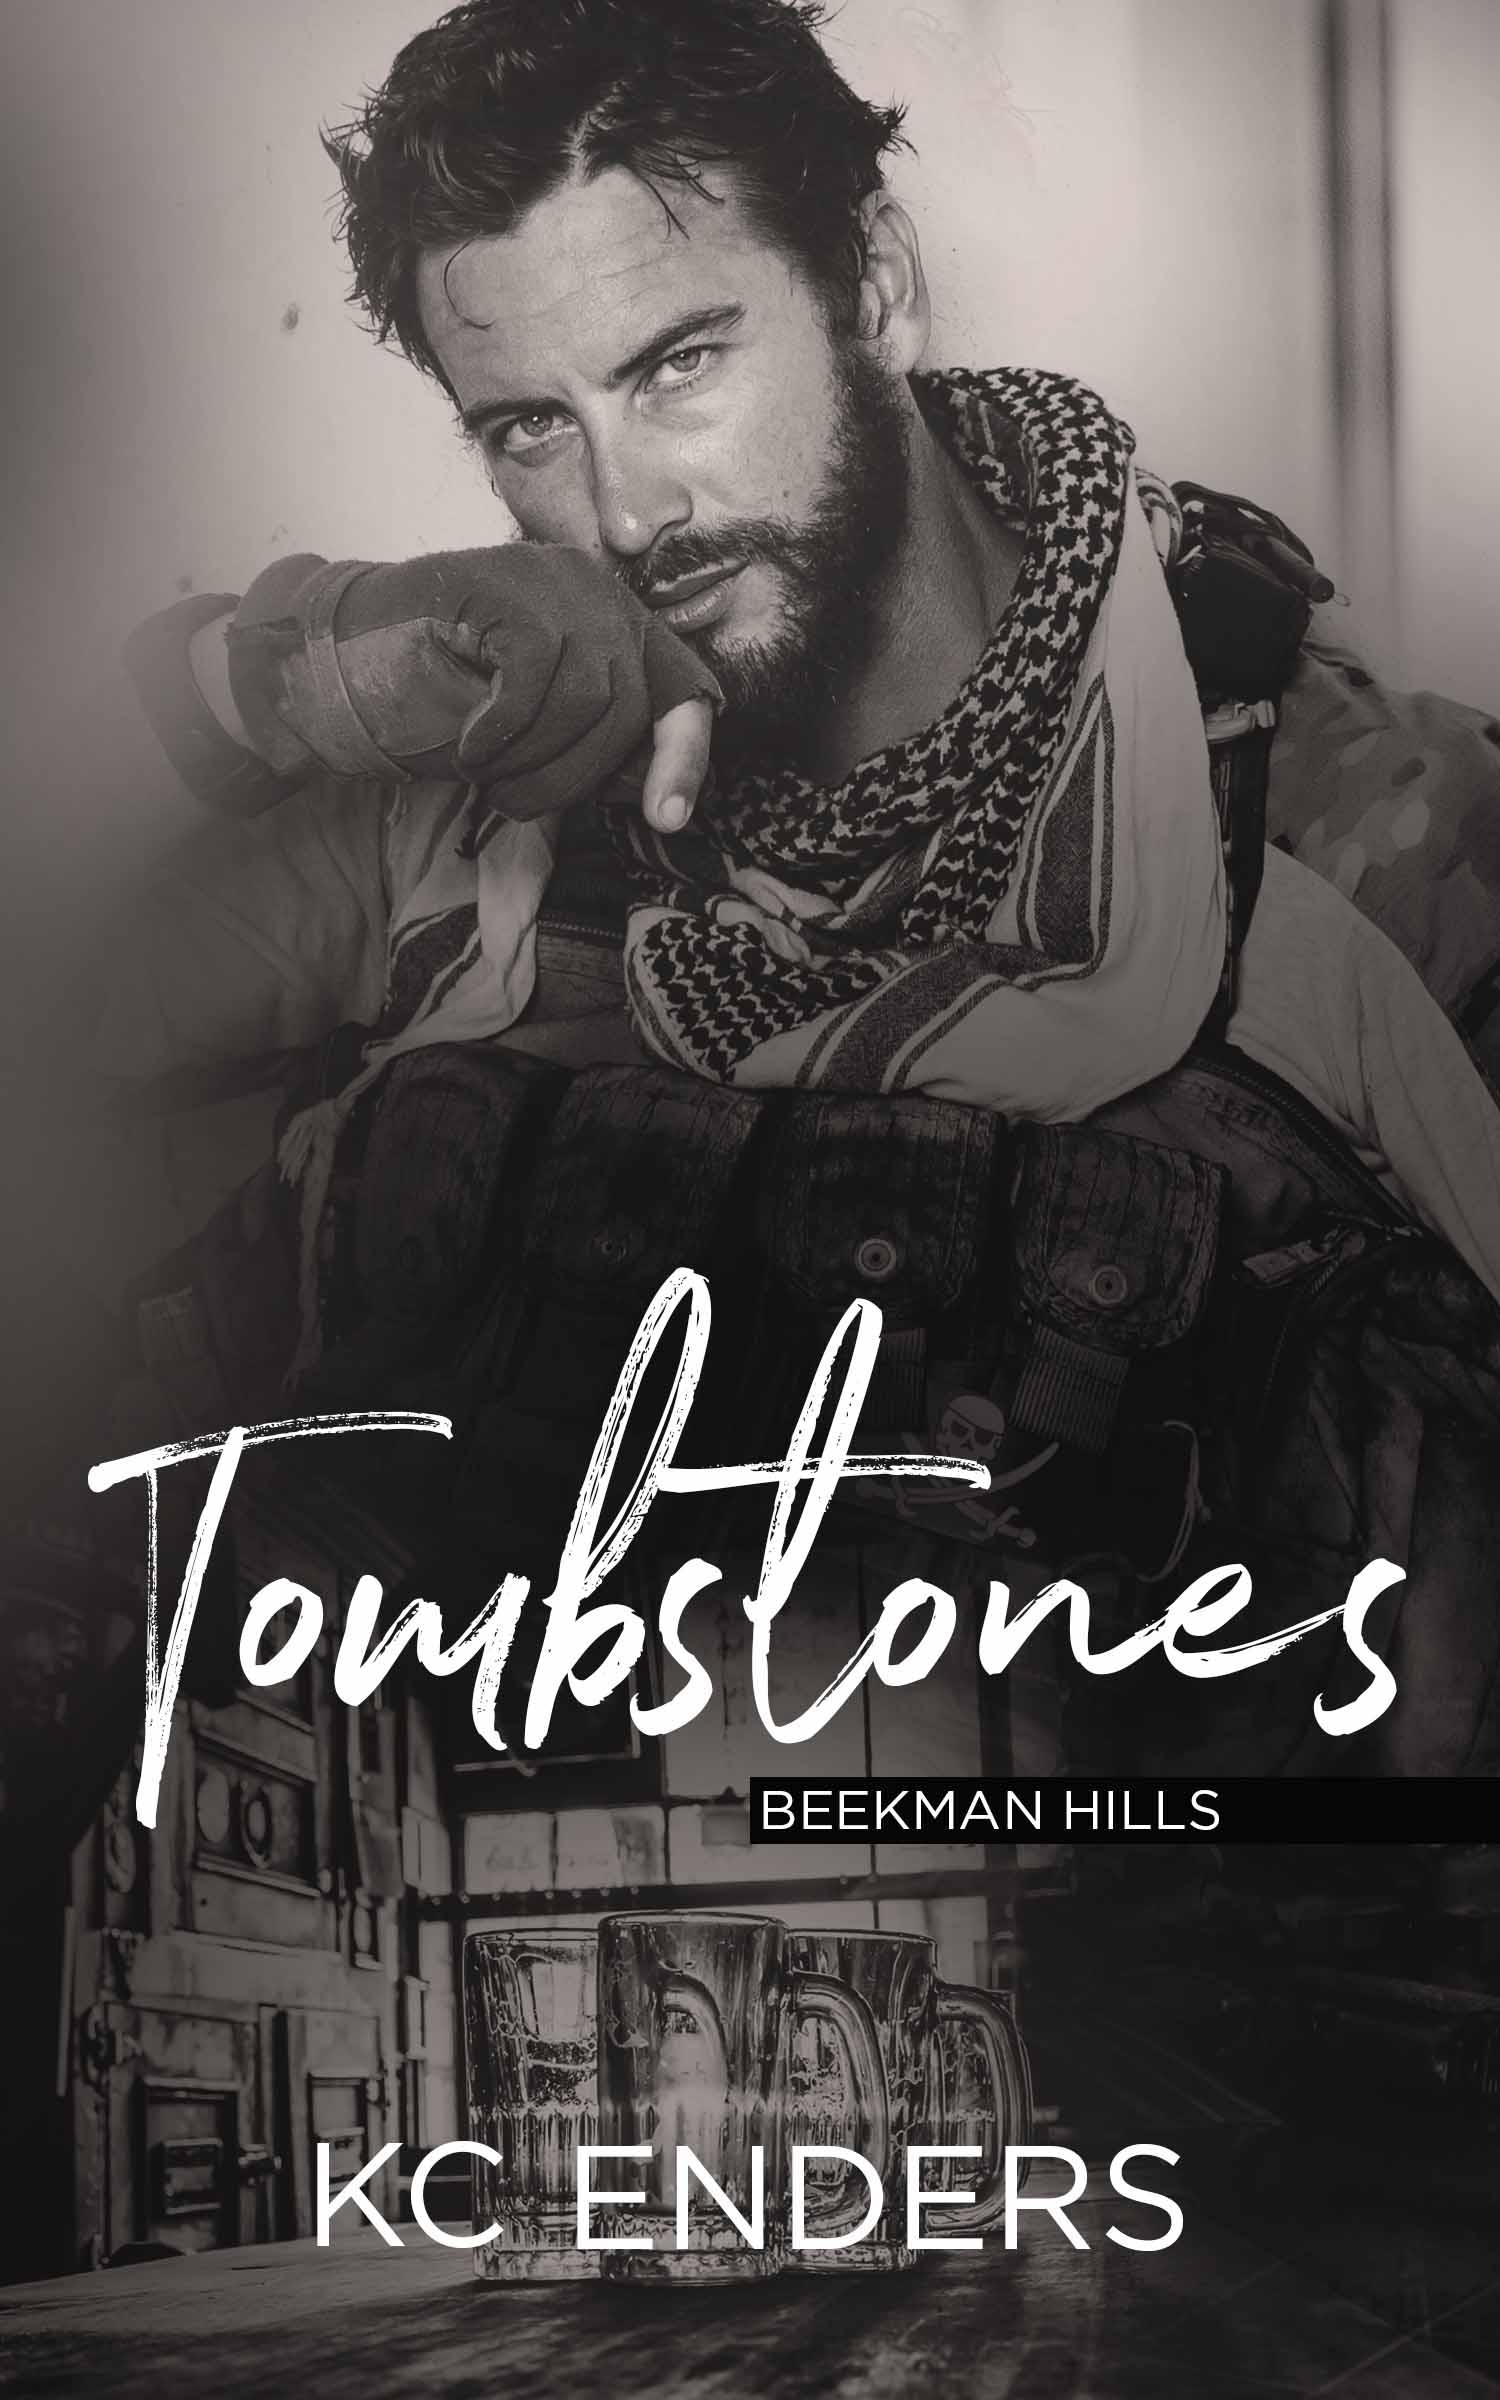 tomstones ebook cover.jpg